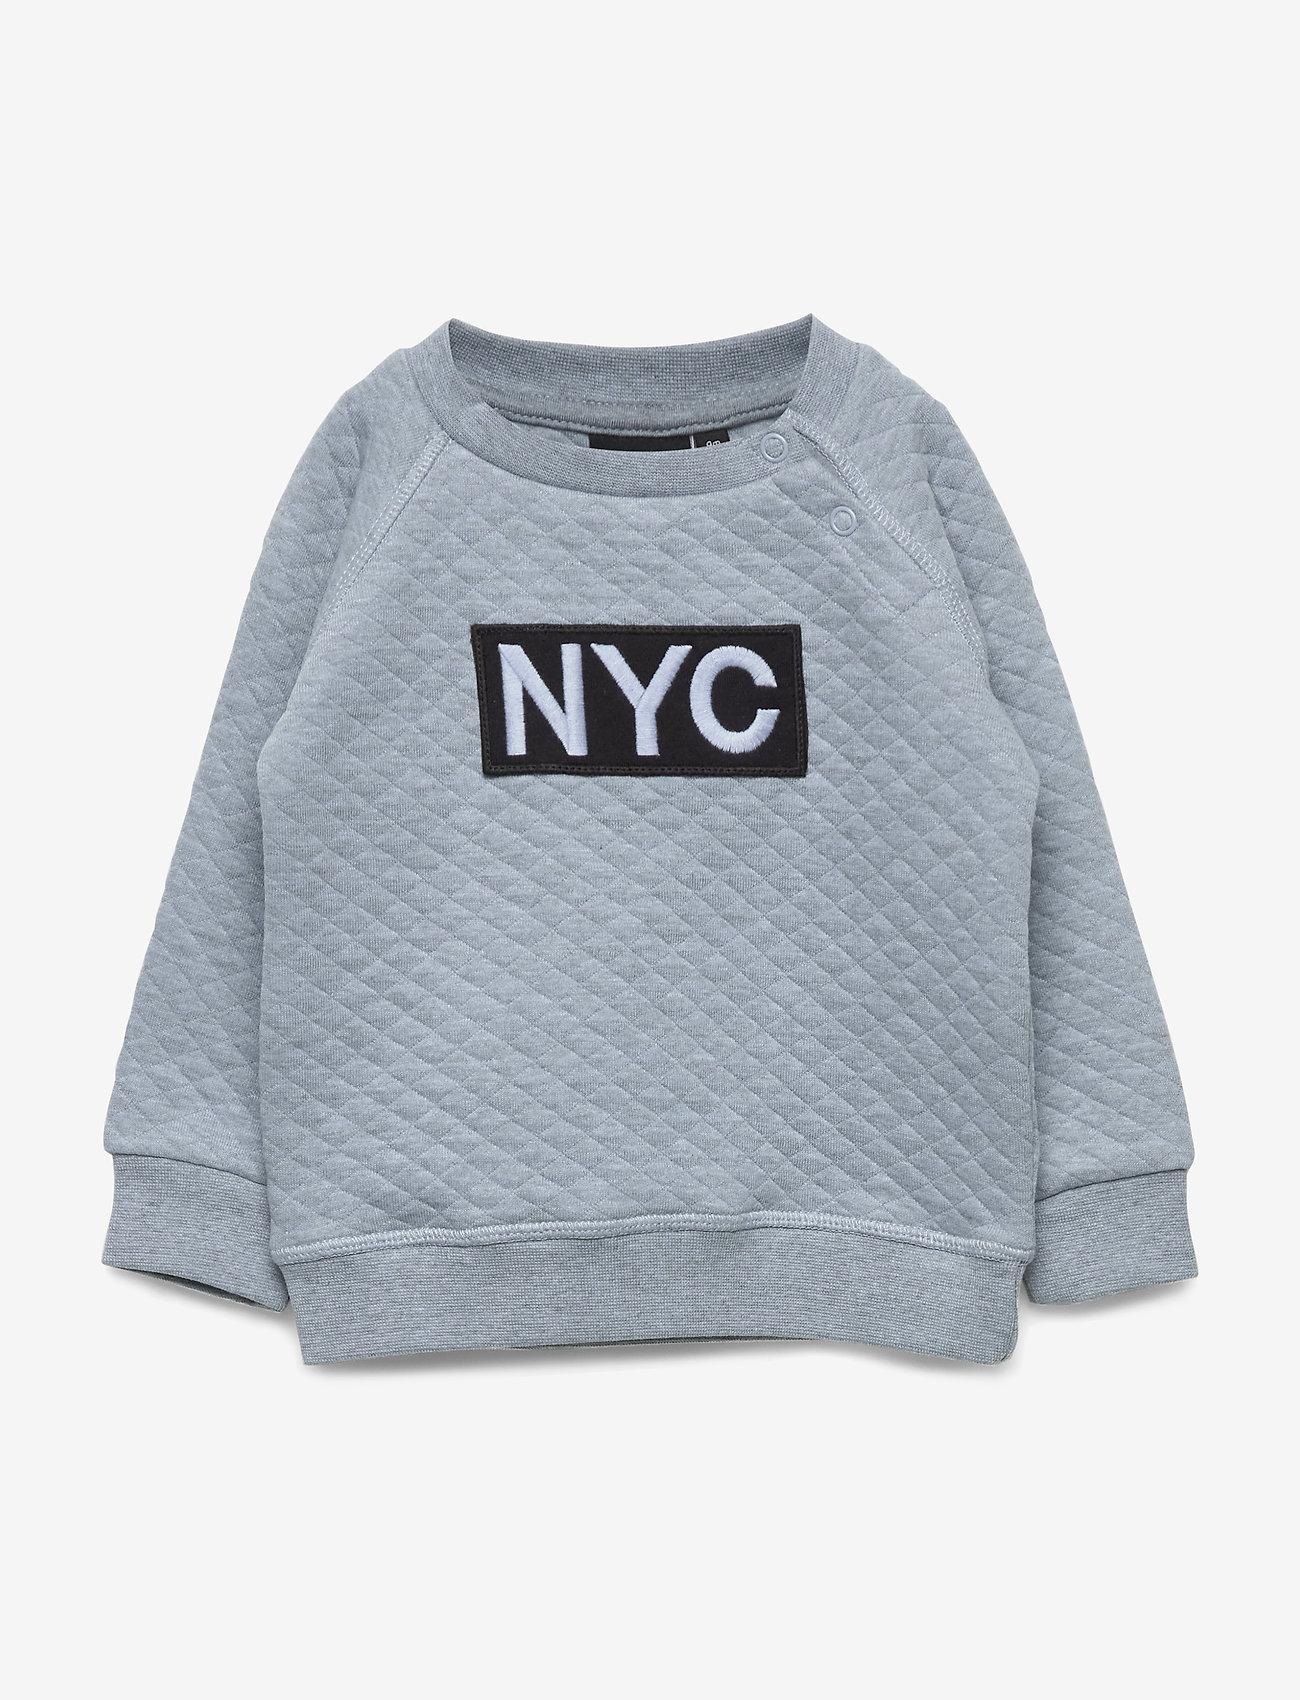 Petit by Sofie Schnoor - Sweat NYC - sweatshirts - light blue melange - 0